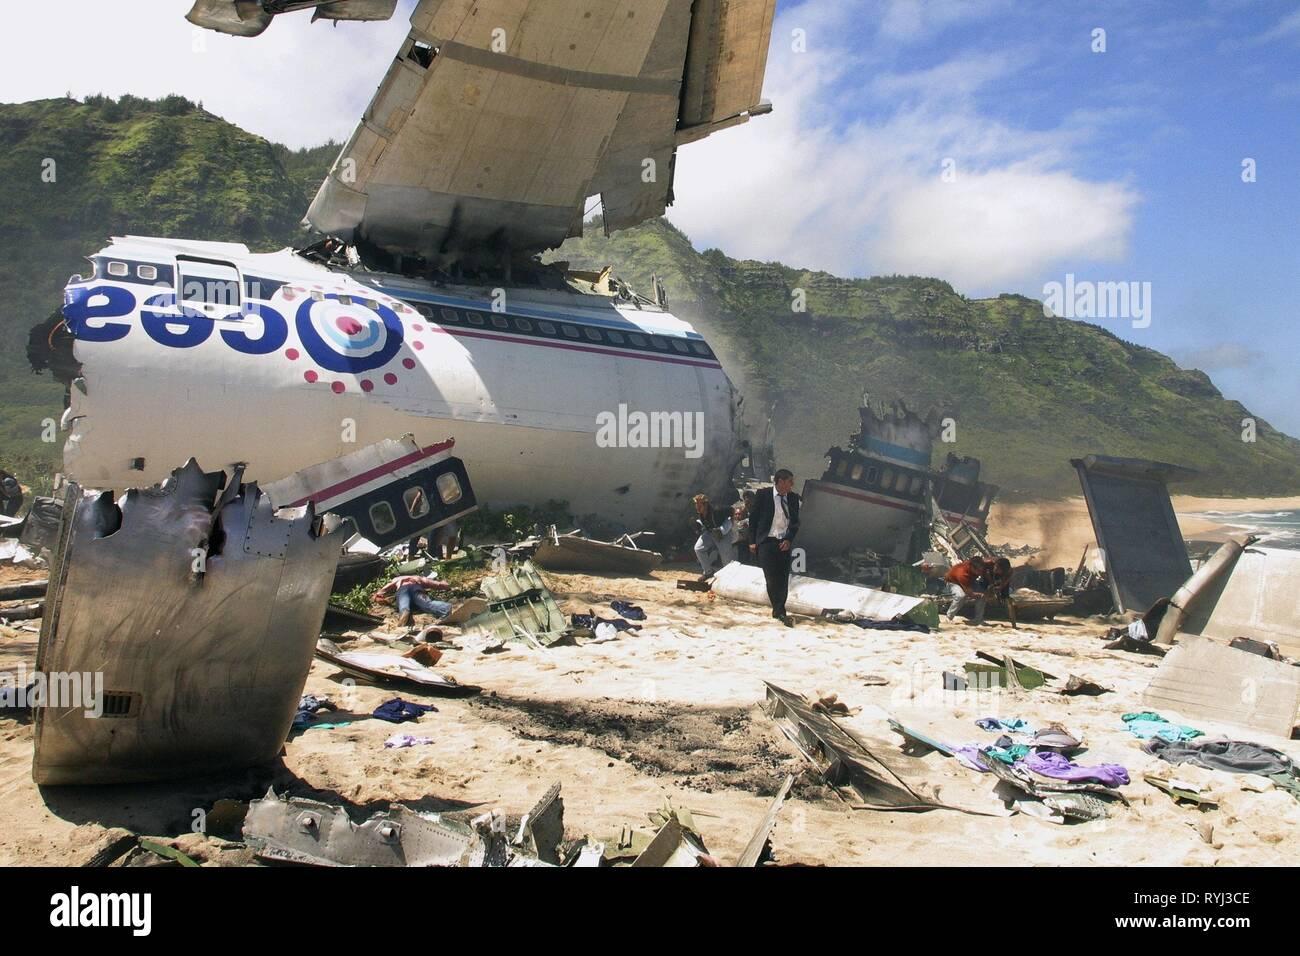 CRASHED PLANE ON ISLAND BEACH, LOST : SEASON 1, 2004 - Stock Image